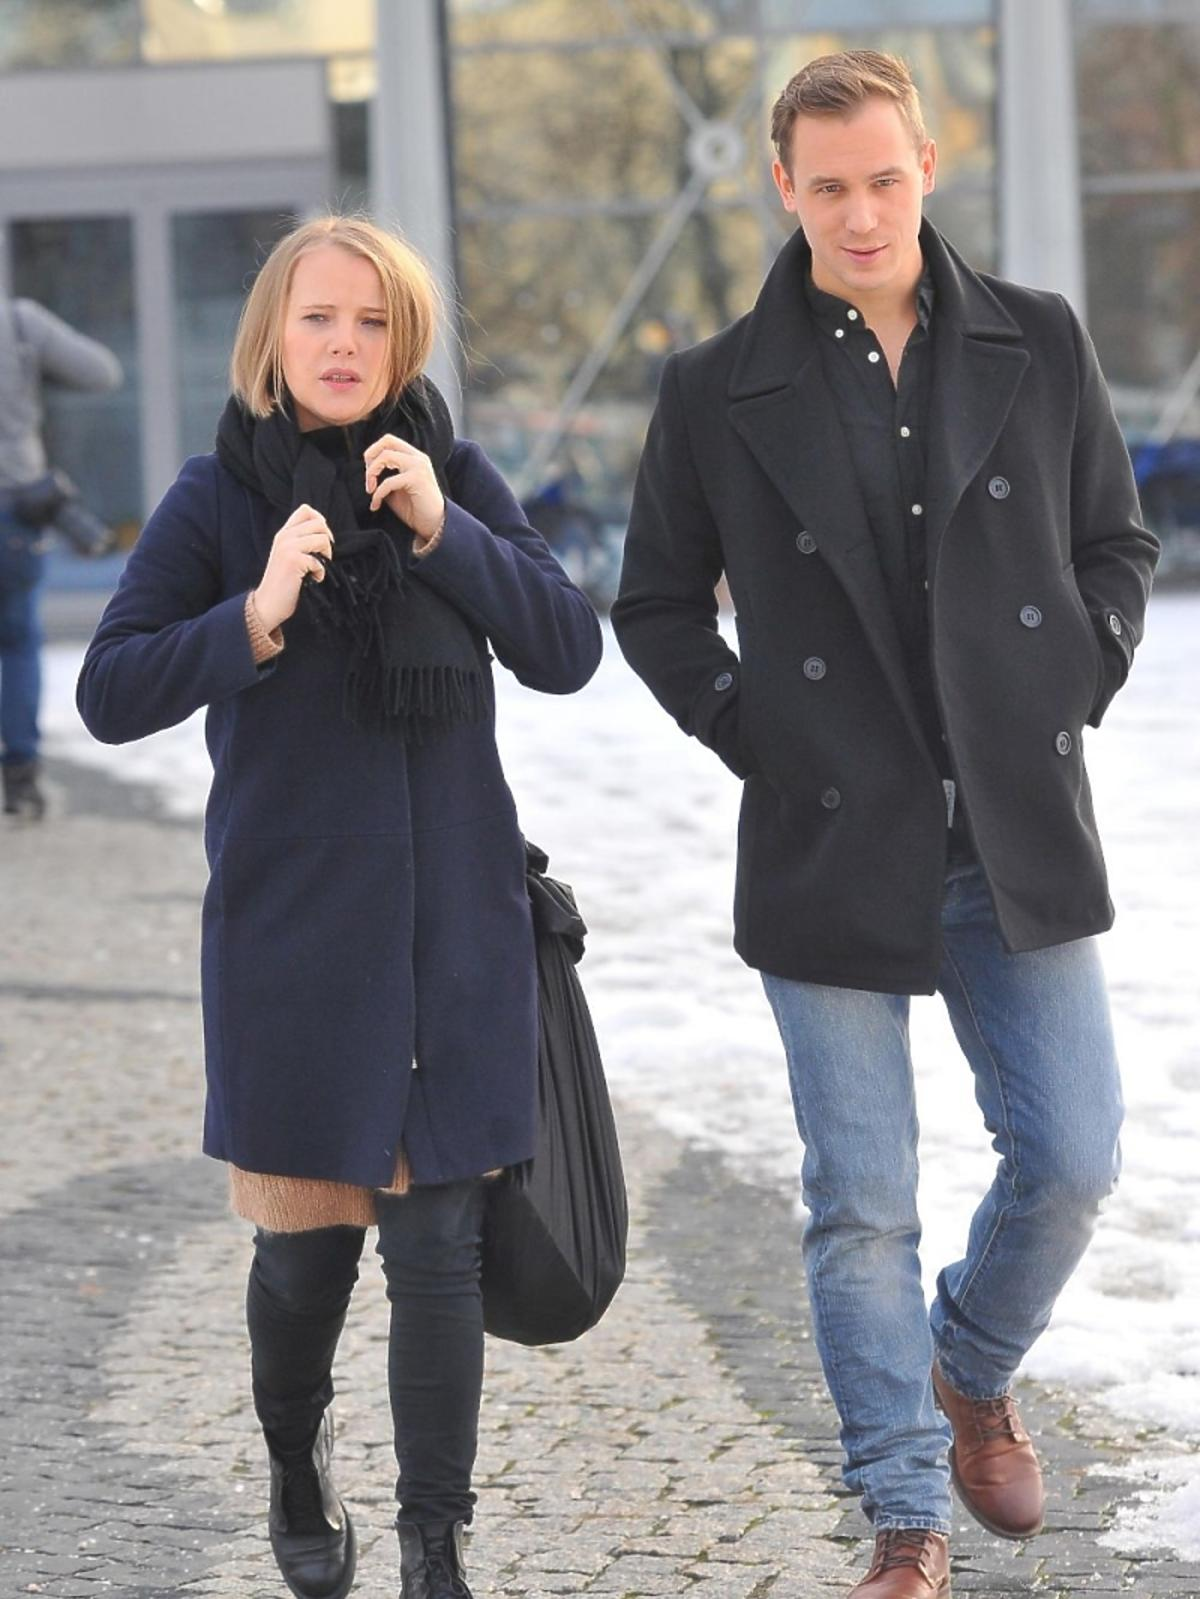 Joanna Kulig i Stefan Pawłowski pod studiem TVP